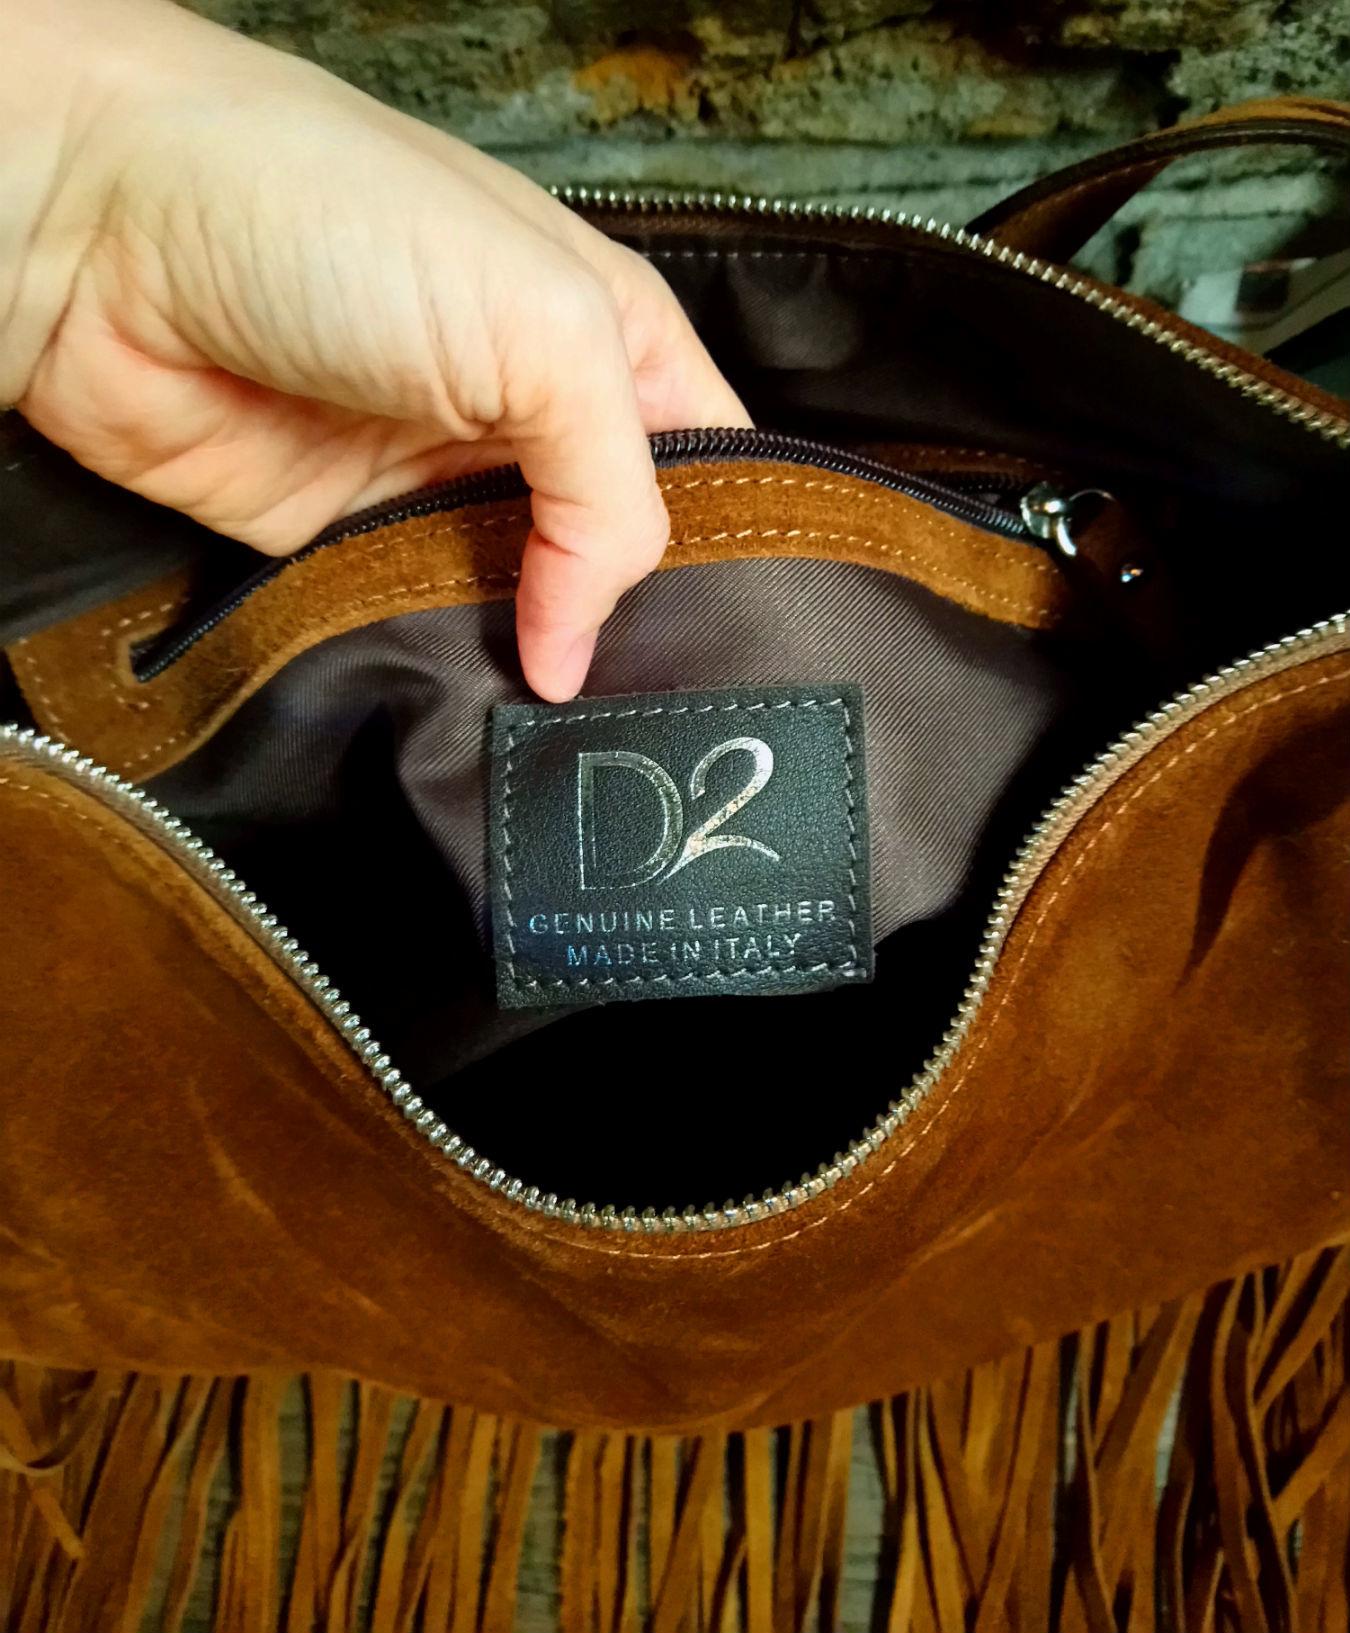 Cactus Creek D2 Leather Fringe Hobo Bag